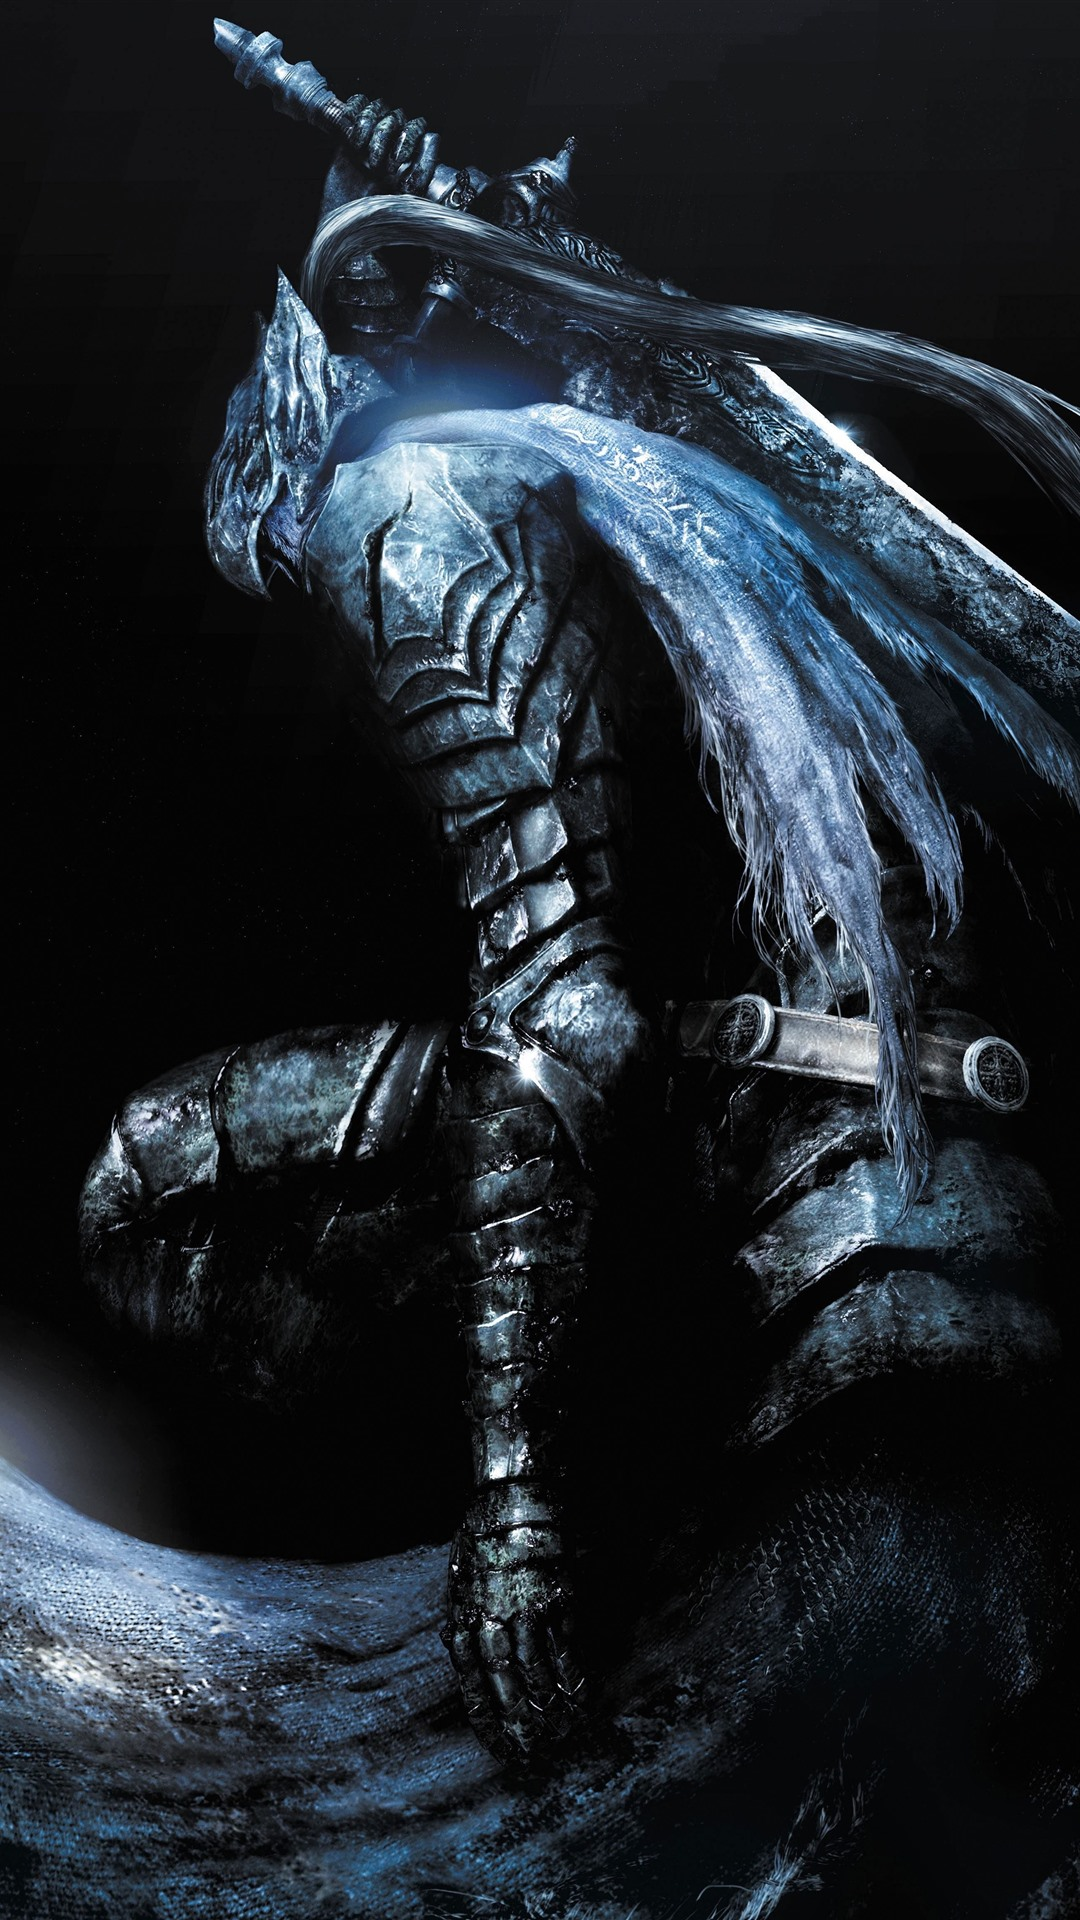 Dark Souls, game art picture 1242x2688